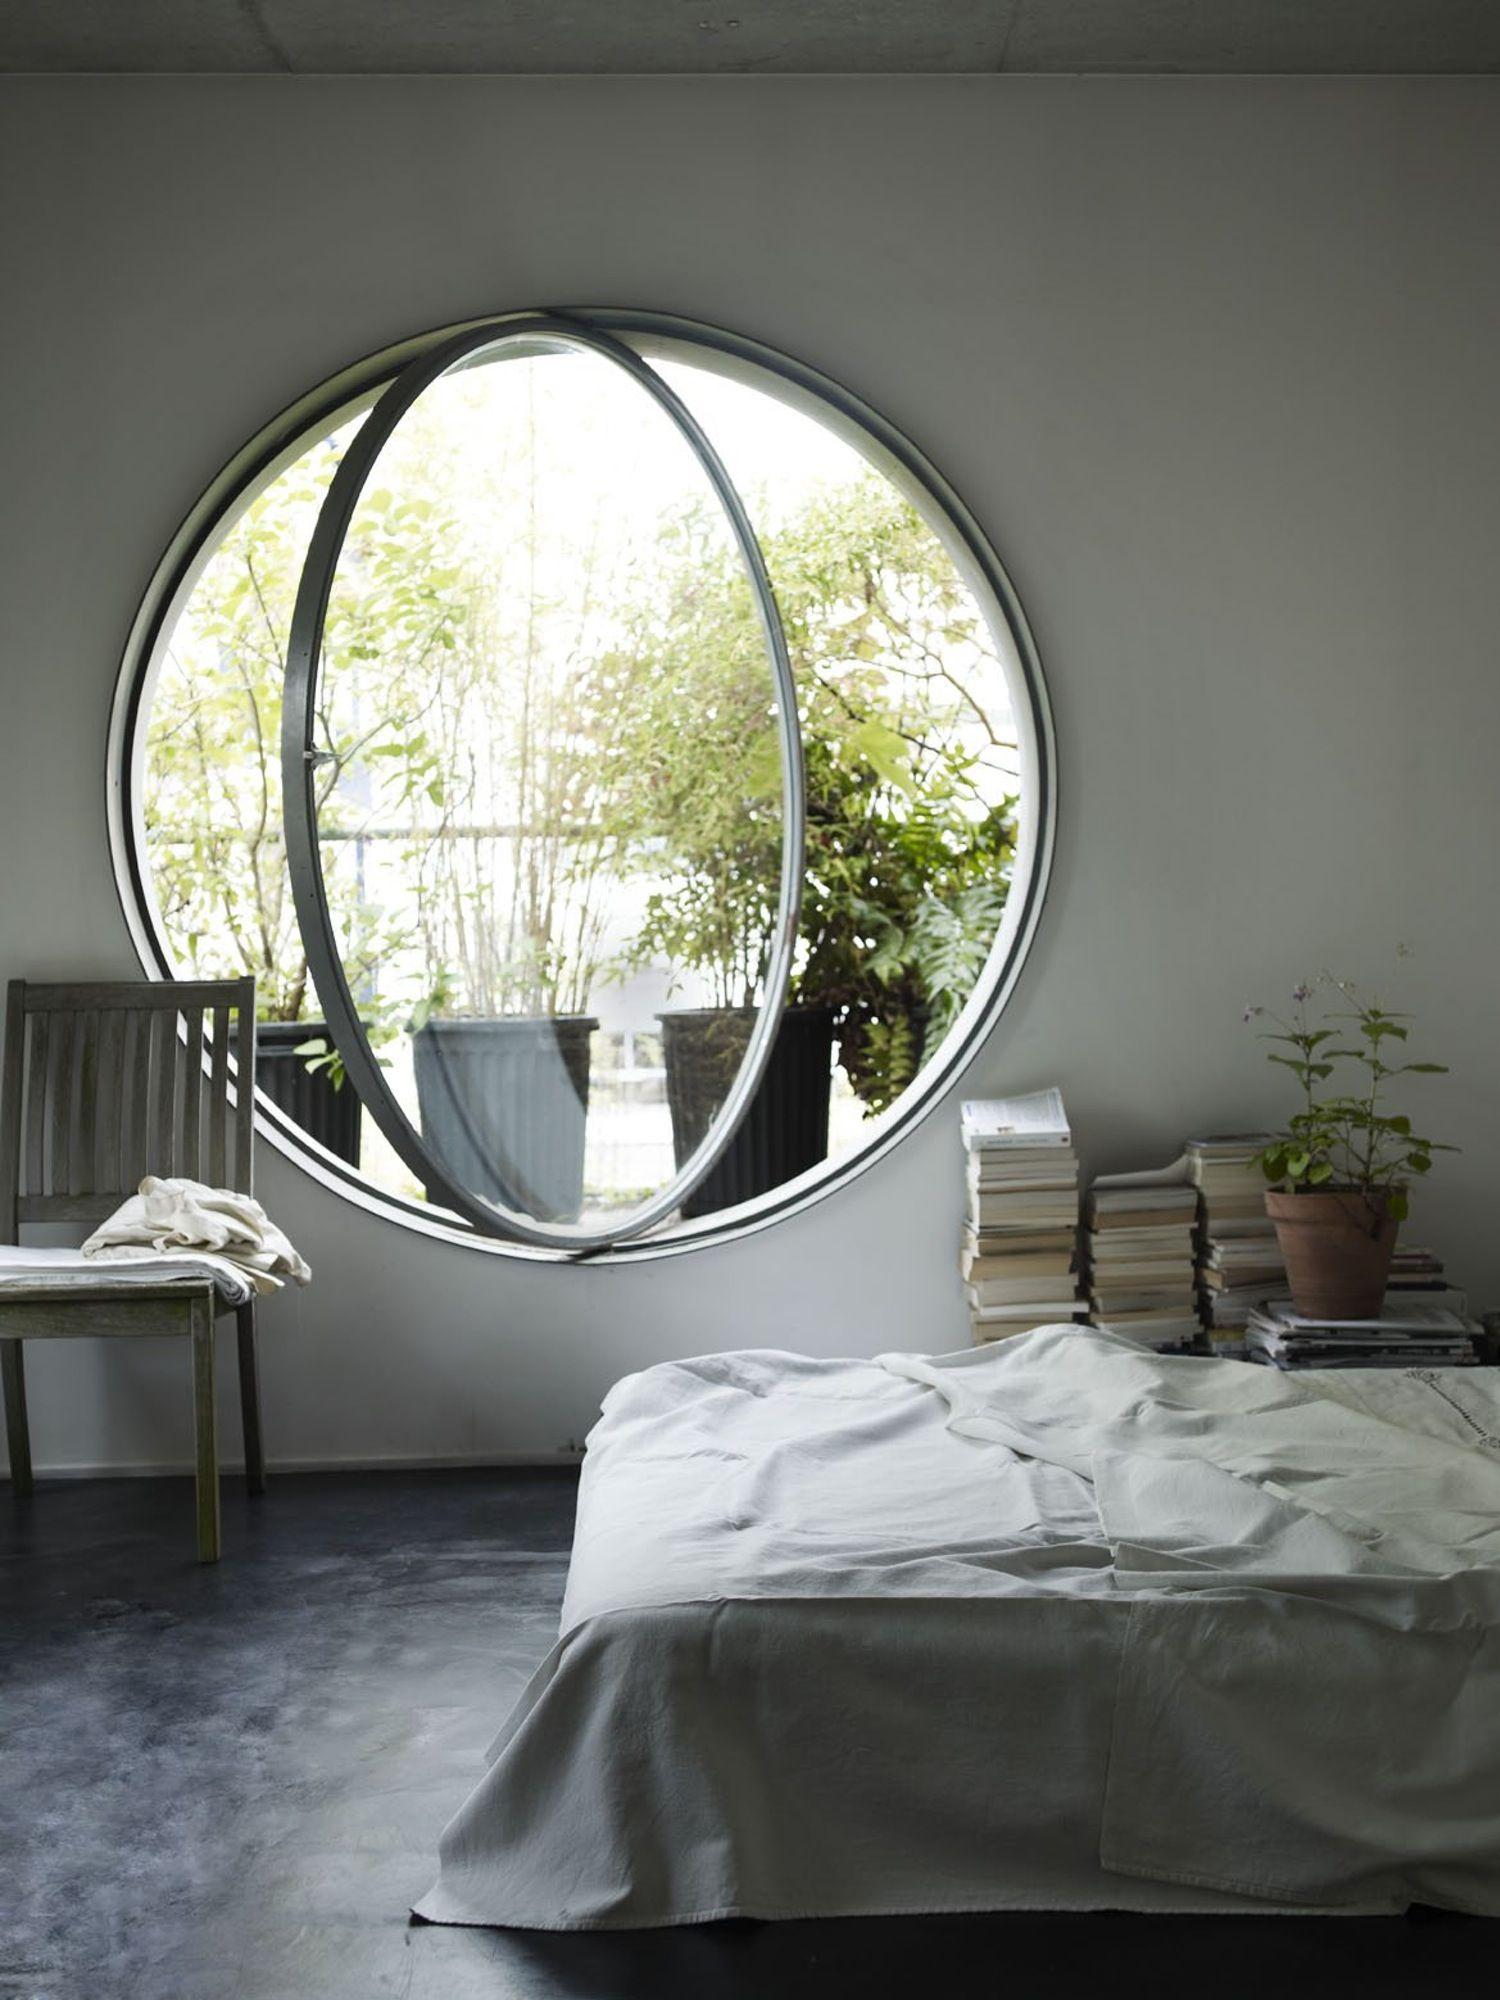 Resultado de imagen de casas con ventanas redondas | Ventanas ...